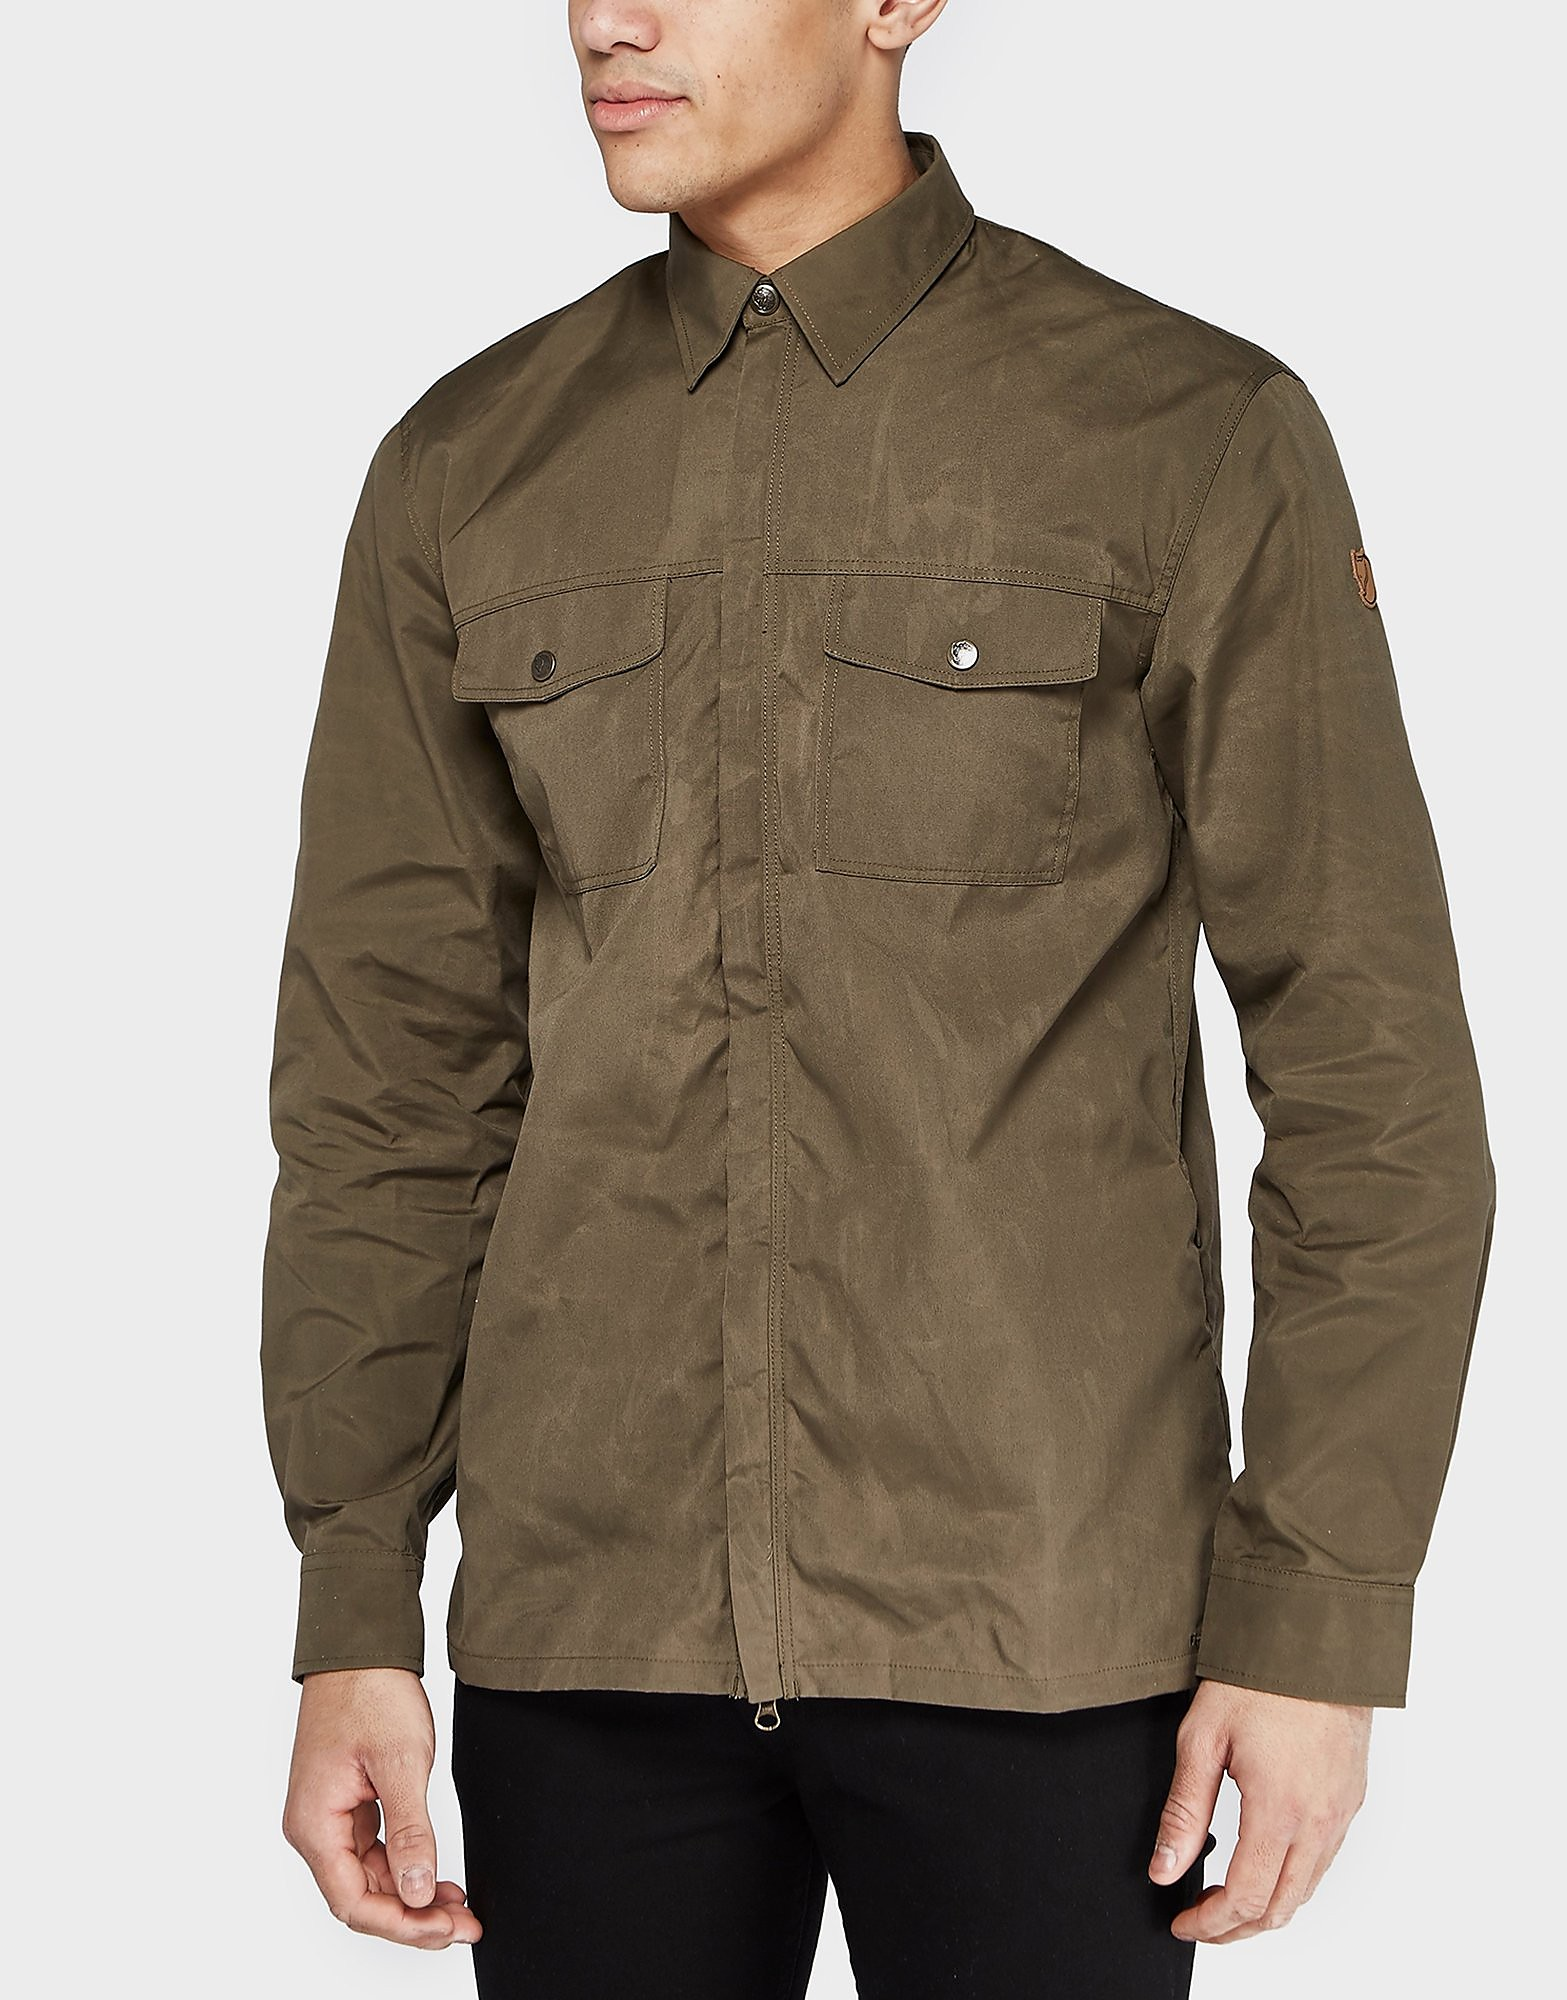 Fjallraven G1000 Long Sleeve Overshirt